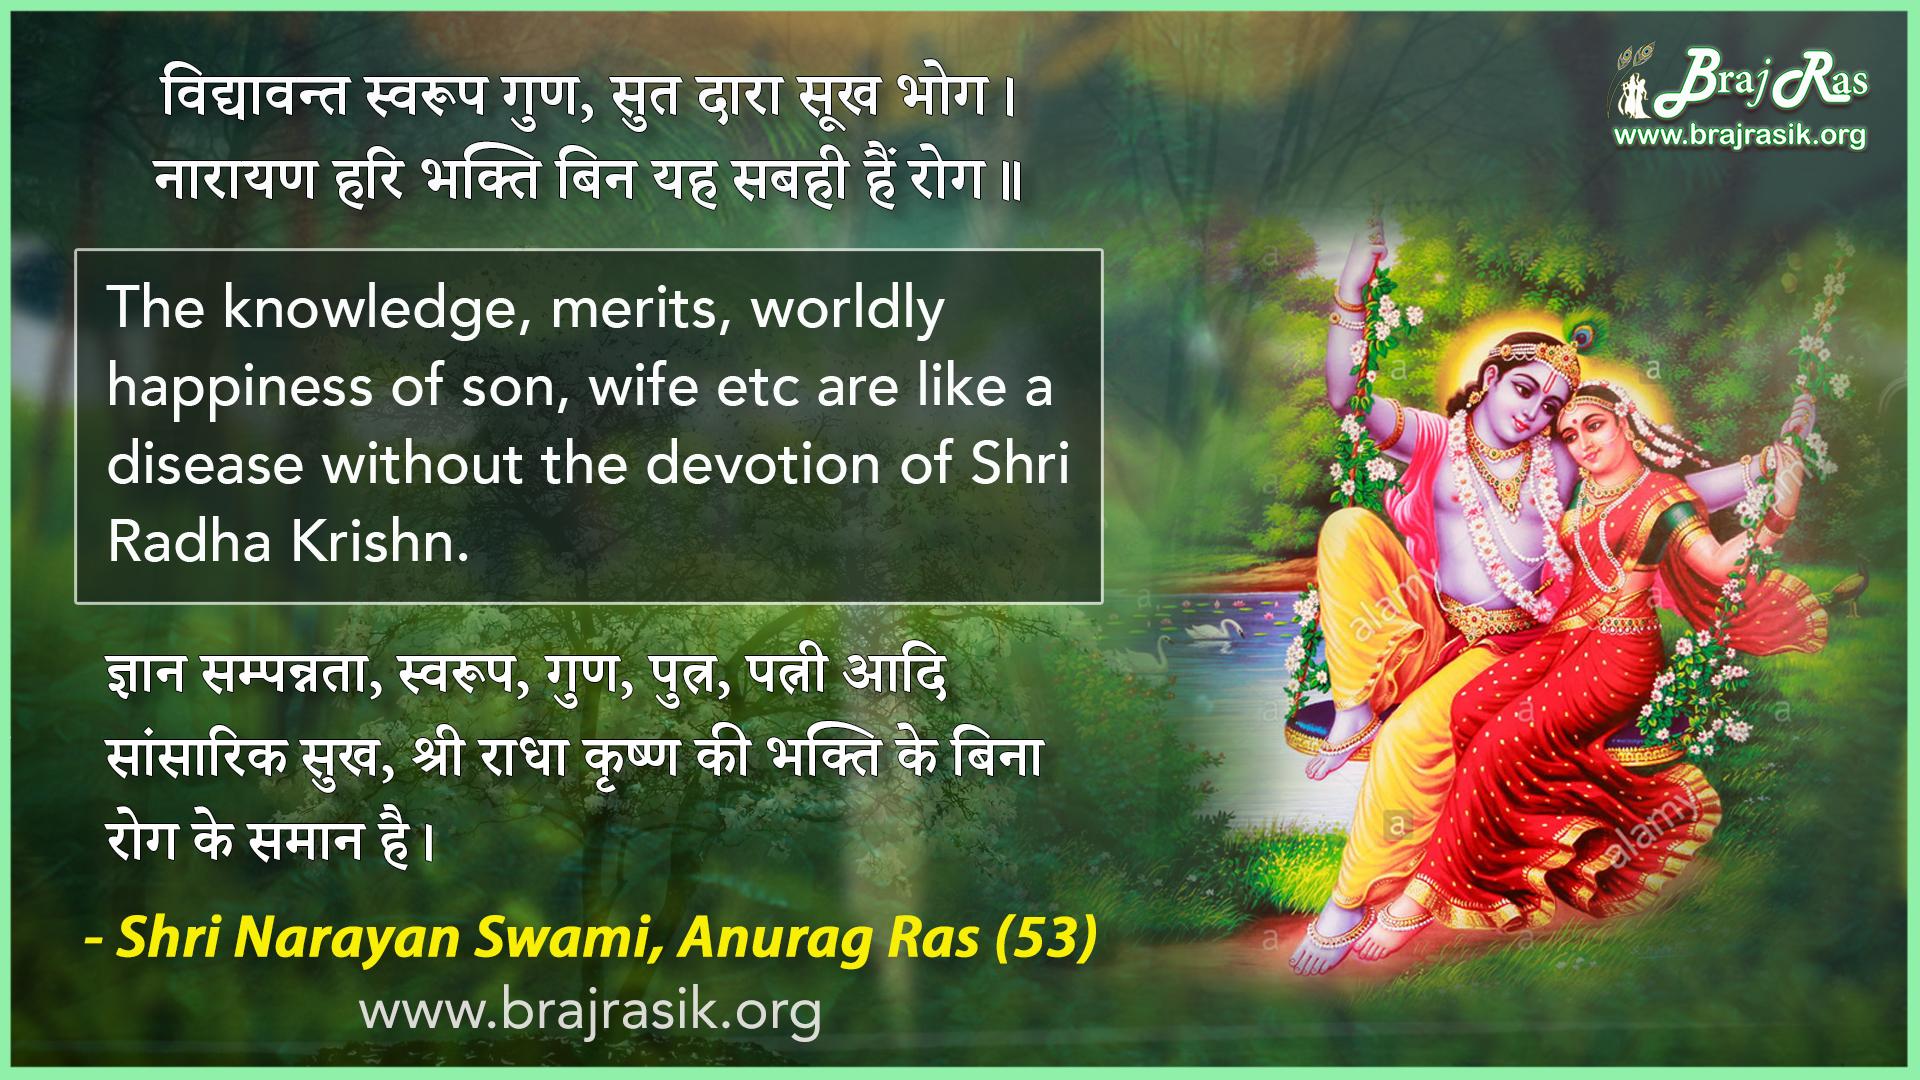 Vidyaavant Swaroop Gun, Sut Daara Sukh Bhog - Shri Narayan Swami, Anurag Ras (53)